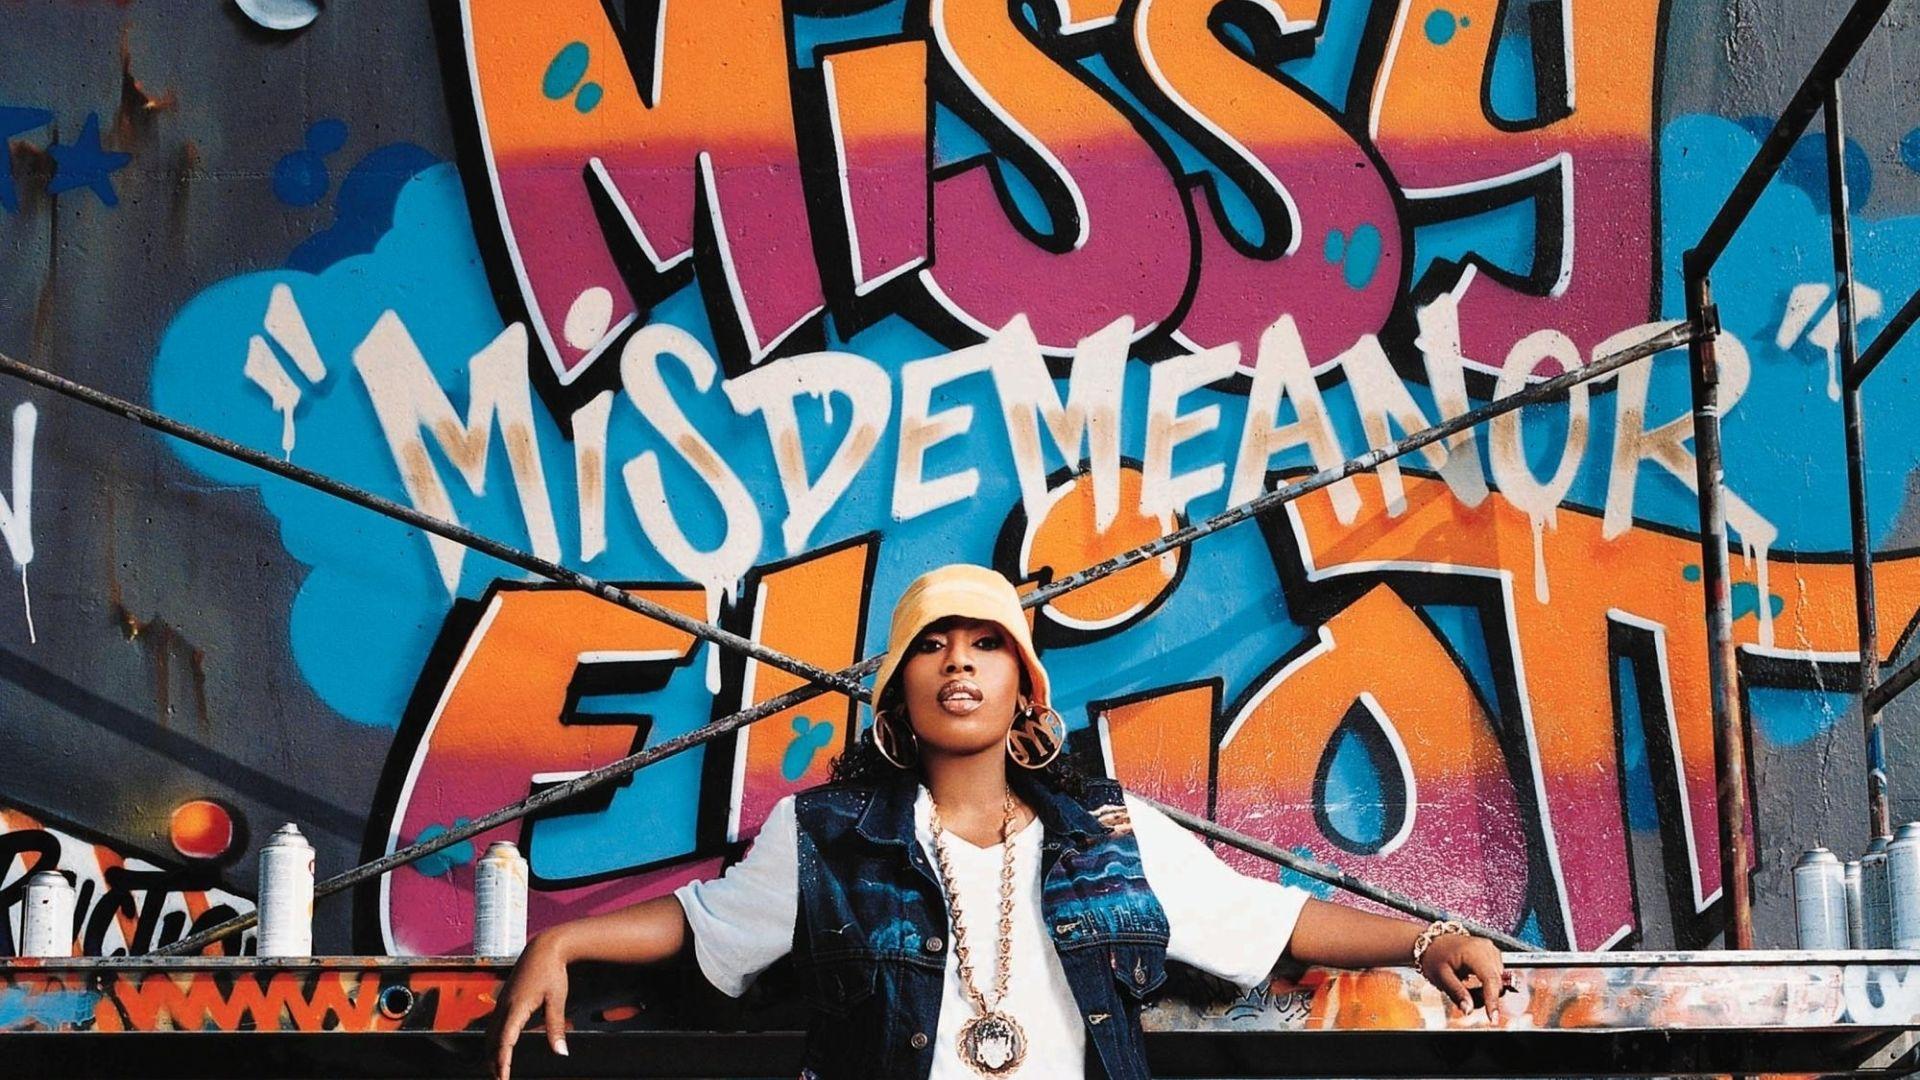 Wallpaper Missy Elliott, celebrity, Graffiti